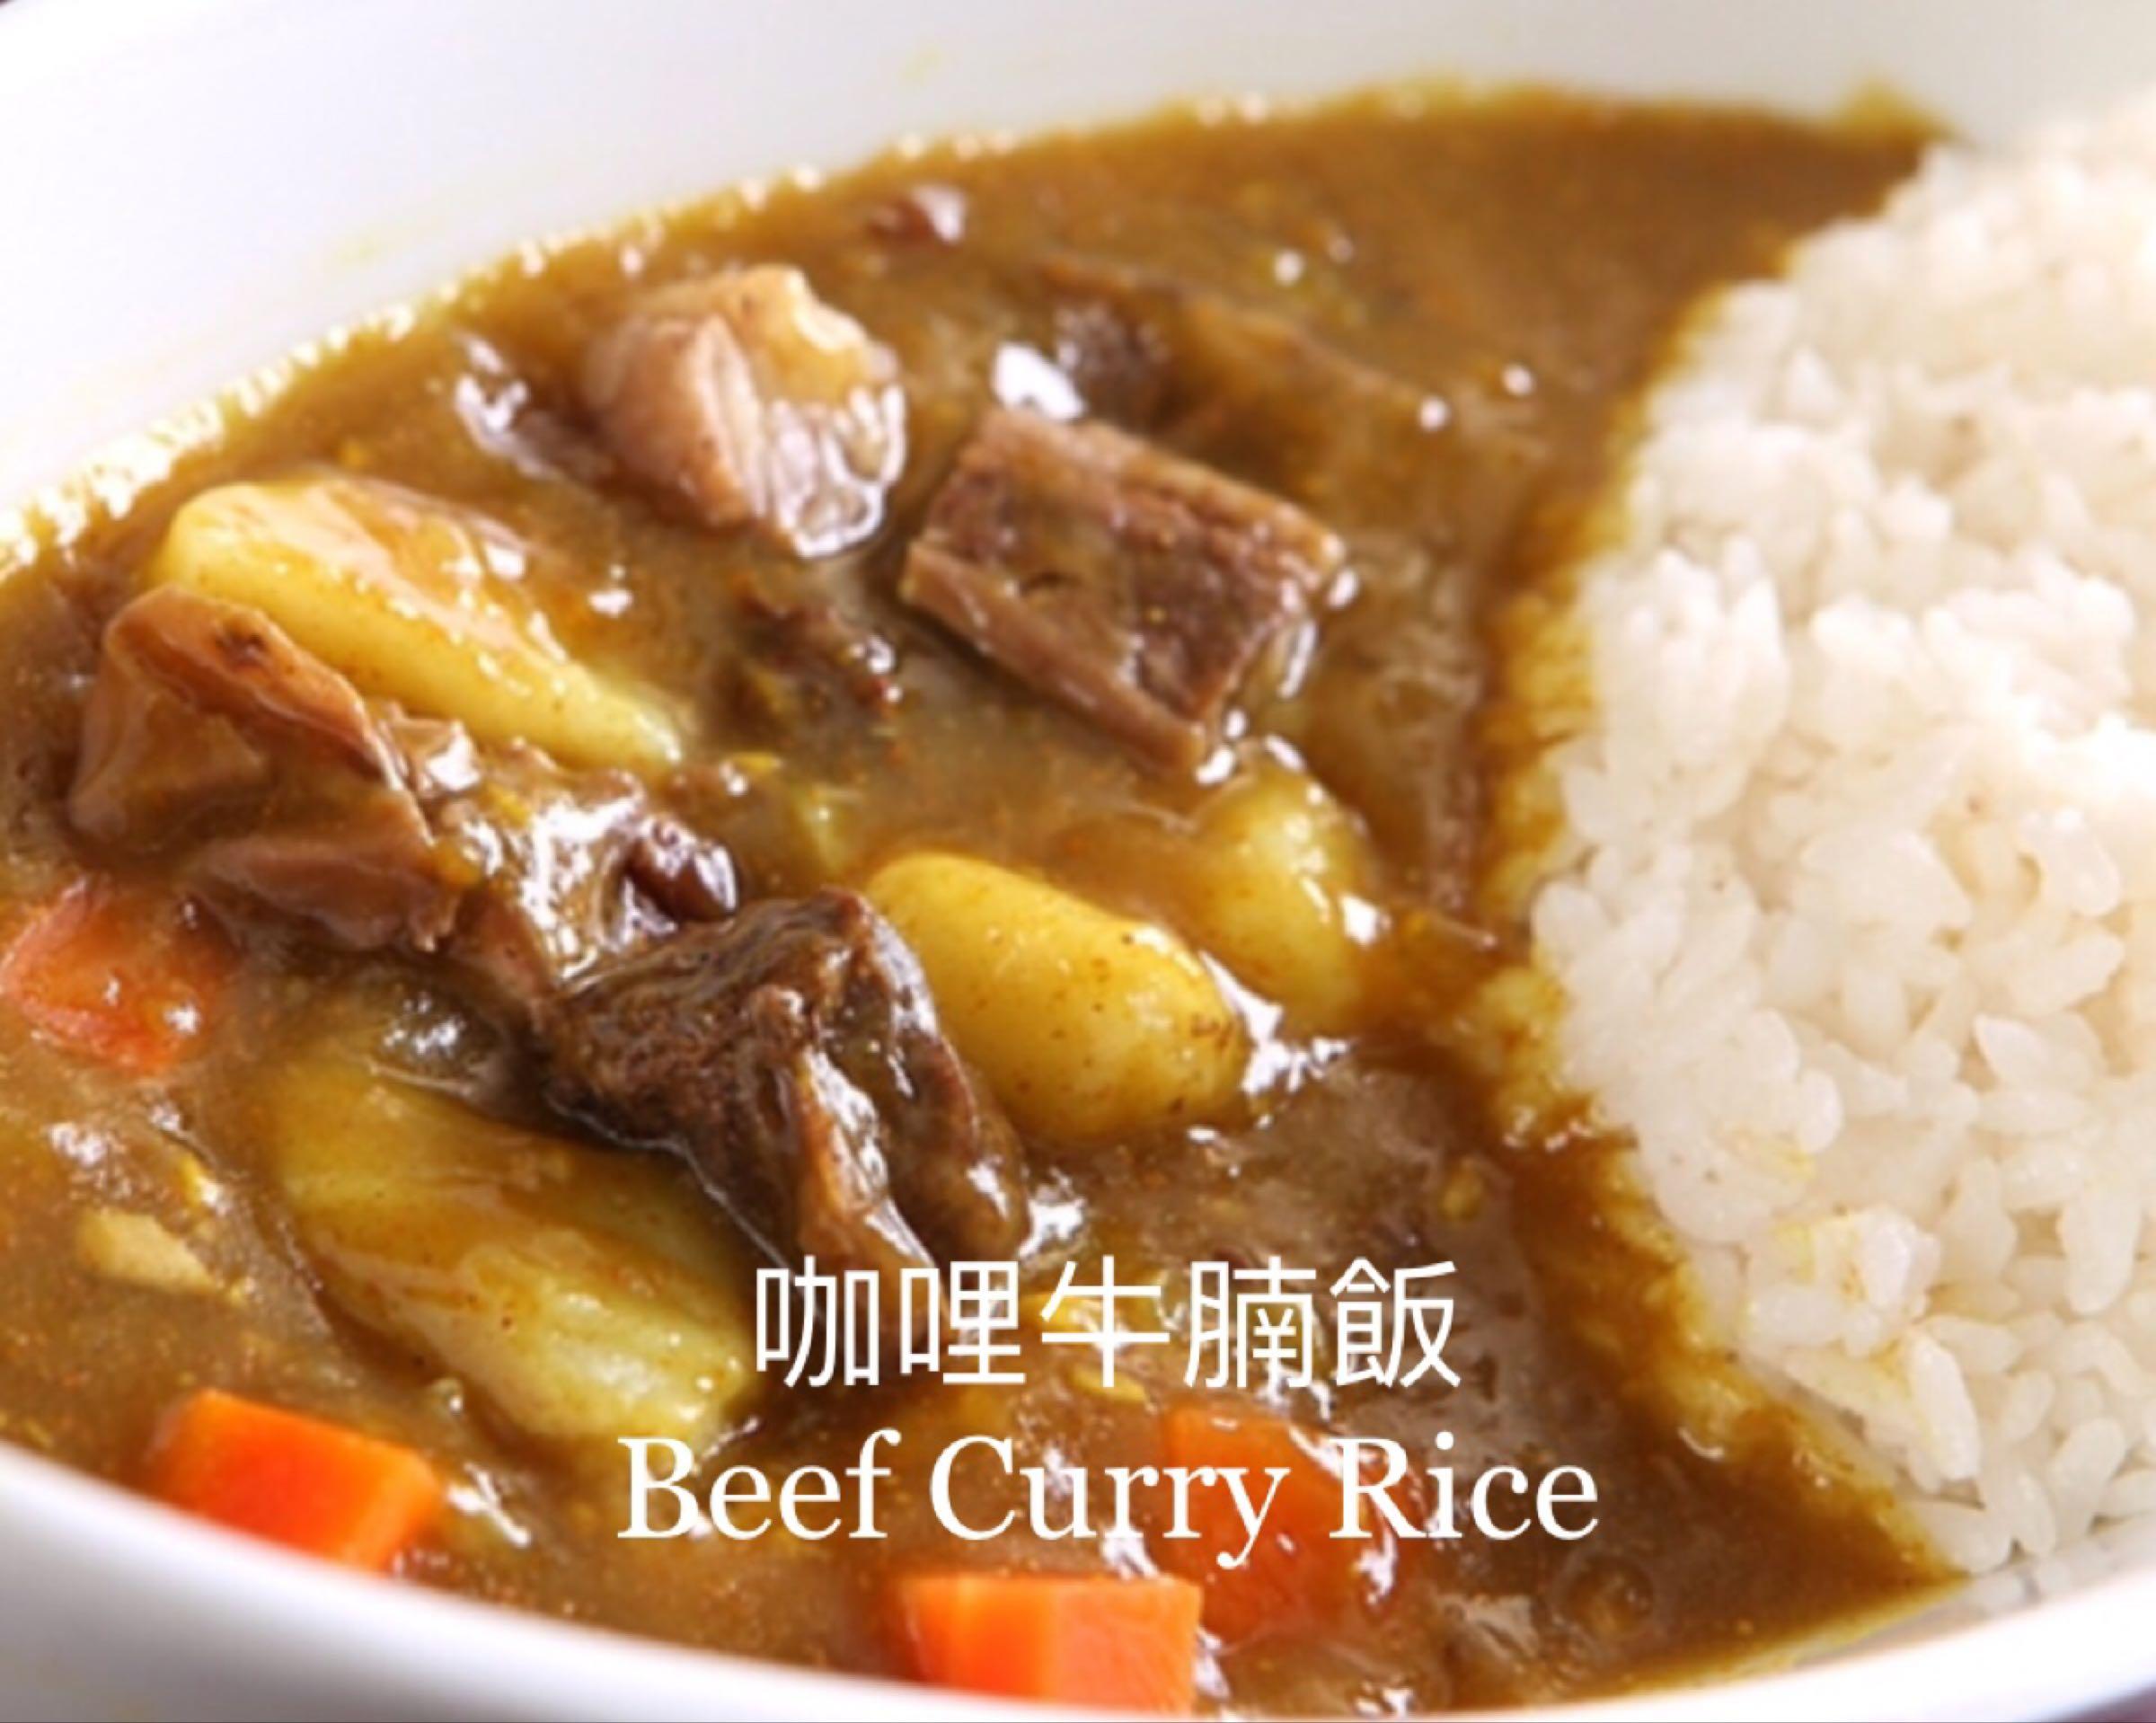 咖哩牛腩飯 Beef Curry Rice